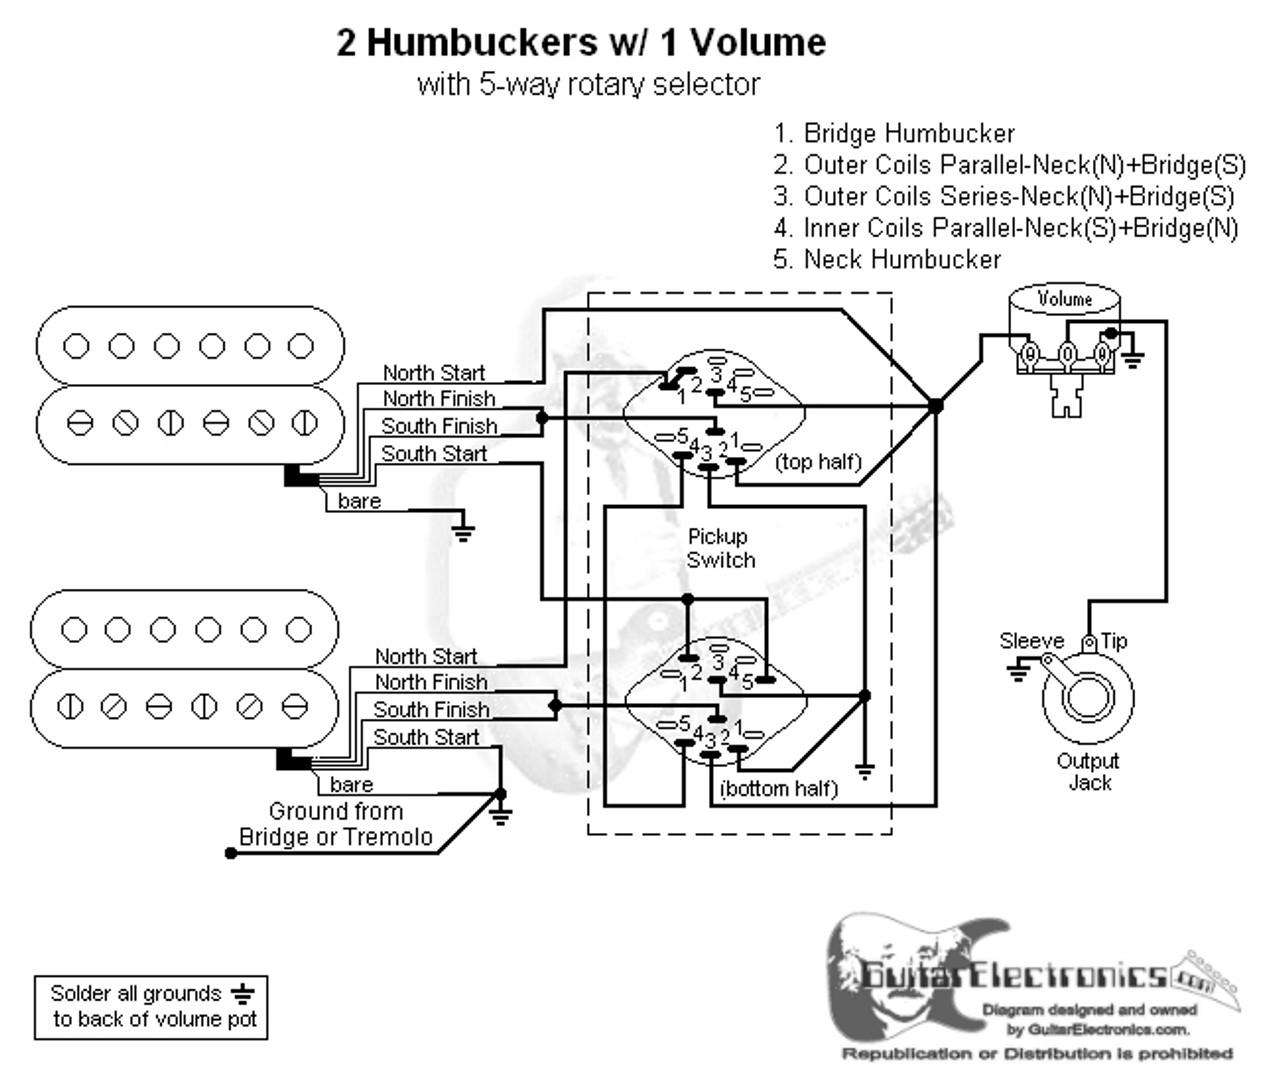 prs 5 way rotary switch wiring diagram diagram data schema2 humbuckers 5 way rotary switch 1 volume 06 prs 5 way rotary switch wiring diagram